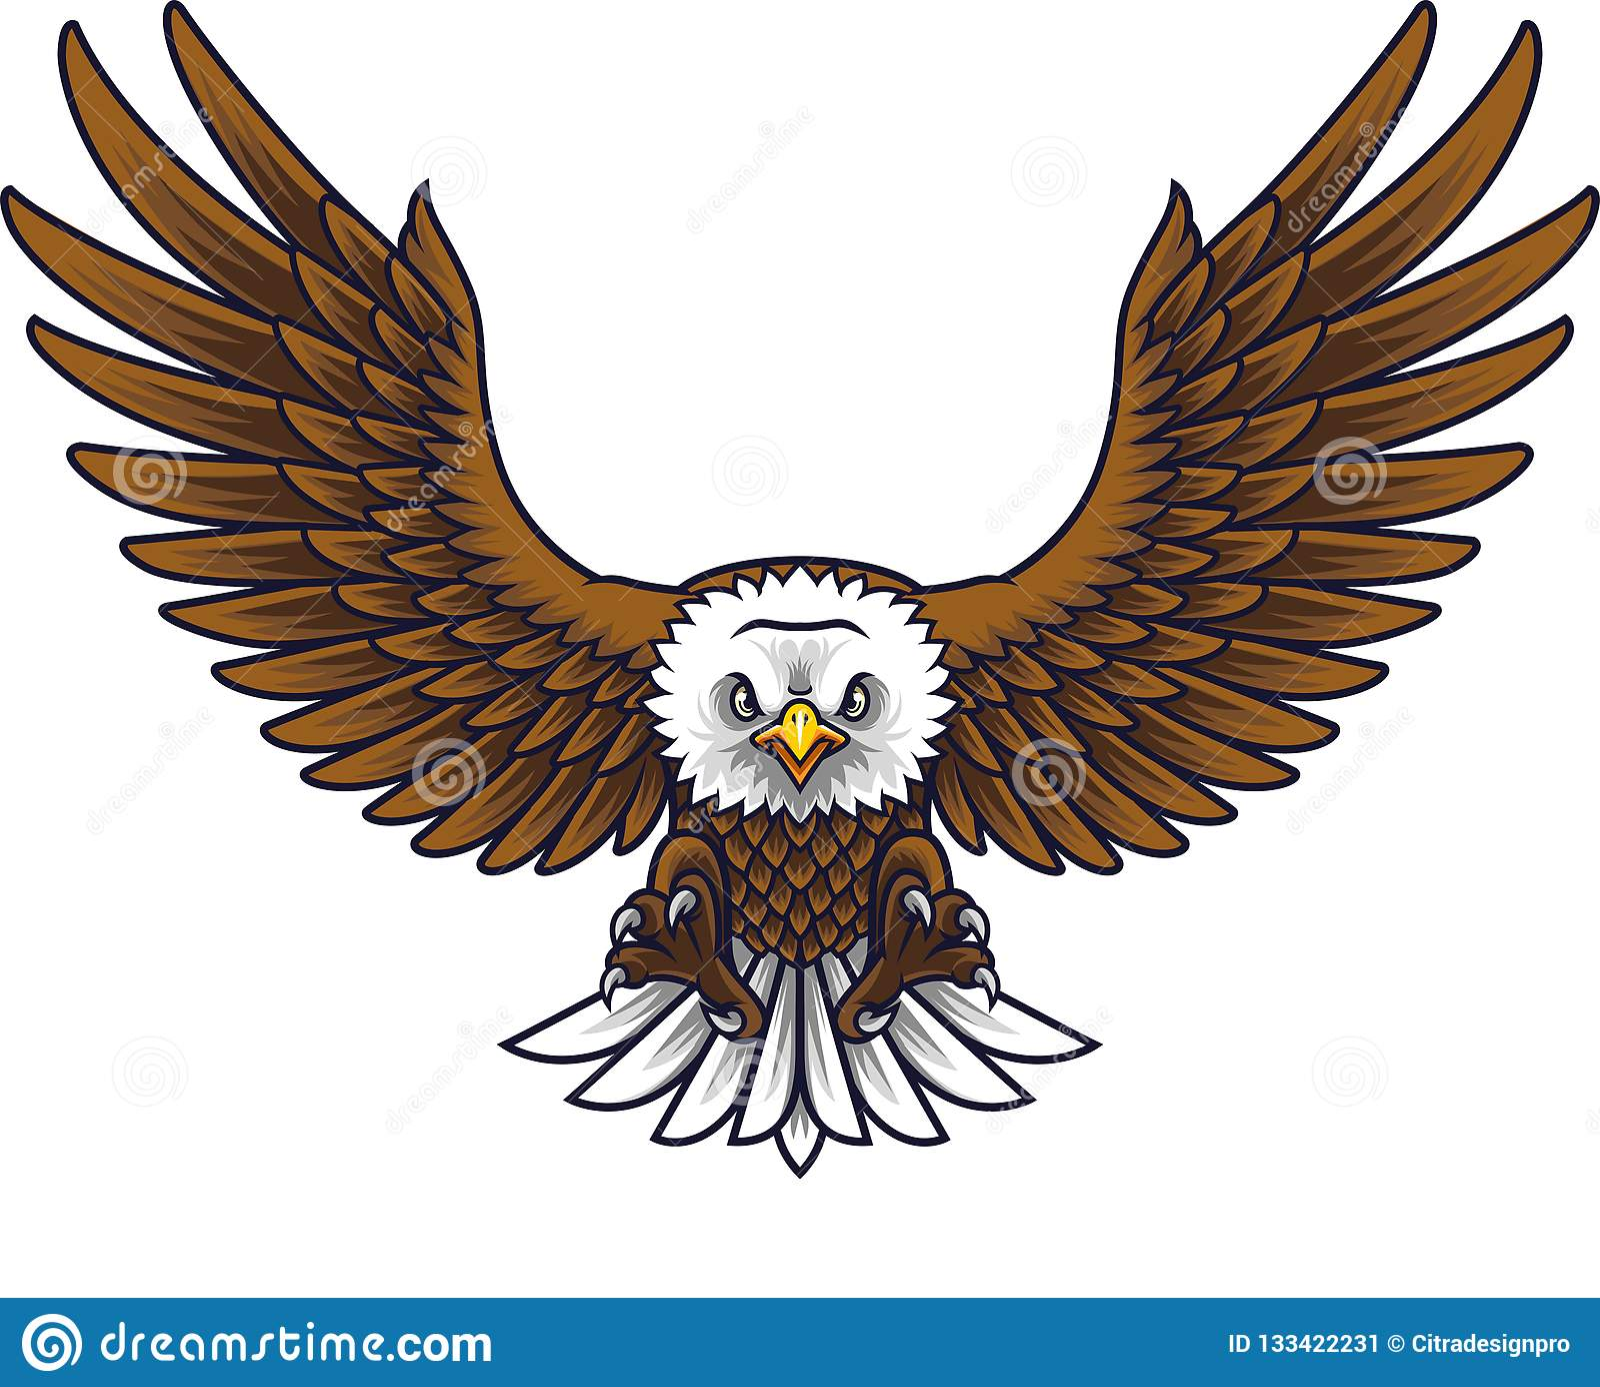 Beeldverhaal Eagle Mascot